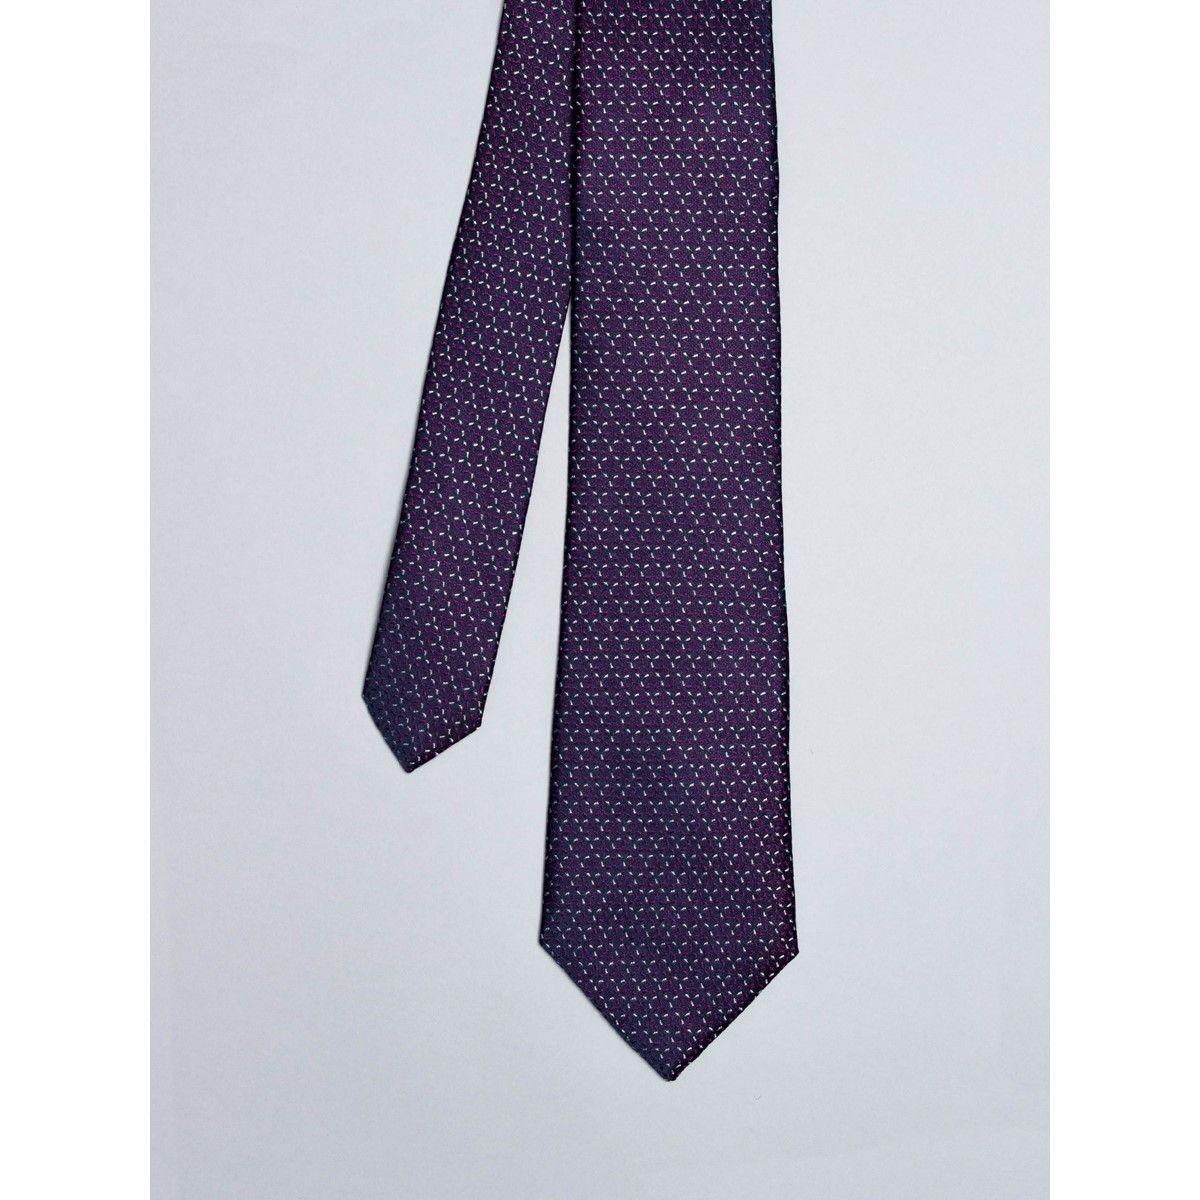 Cravate bleu marine avec motifs étoiles